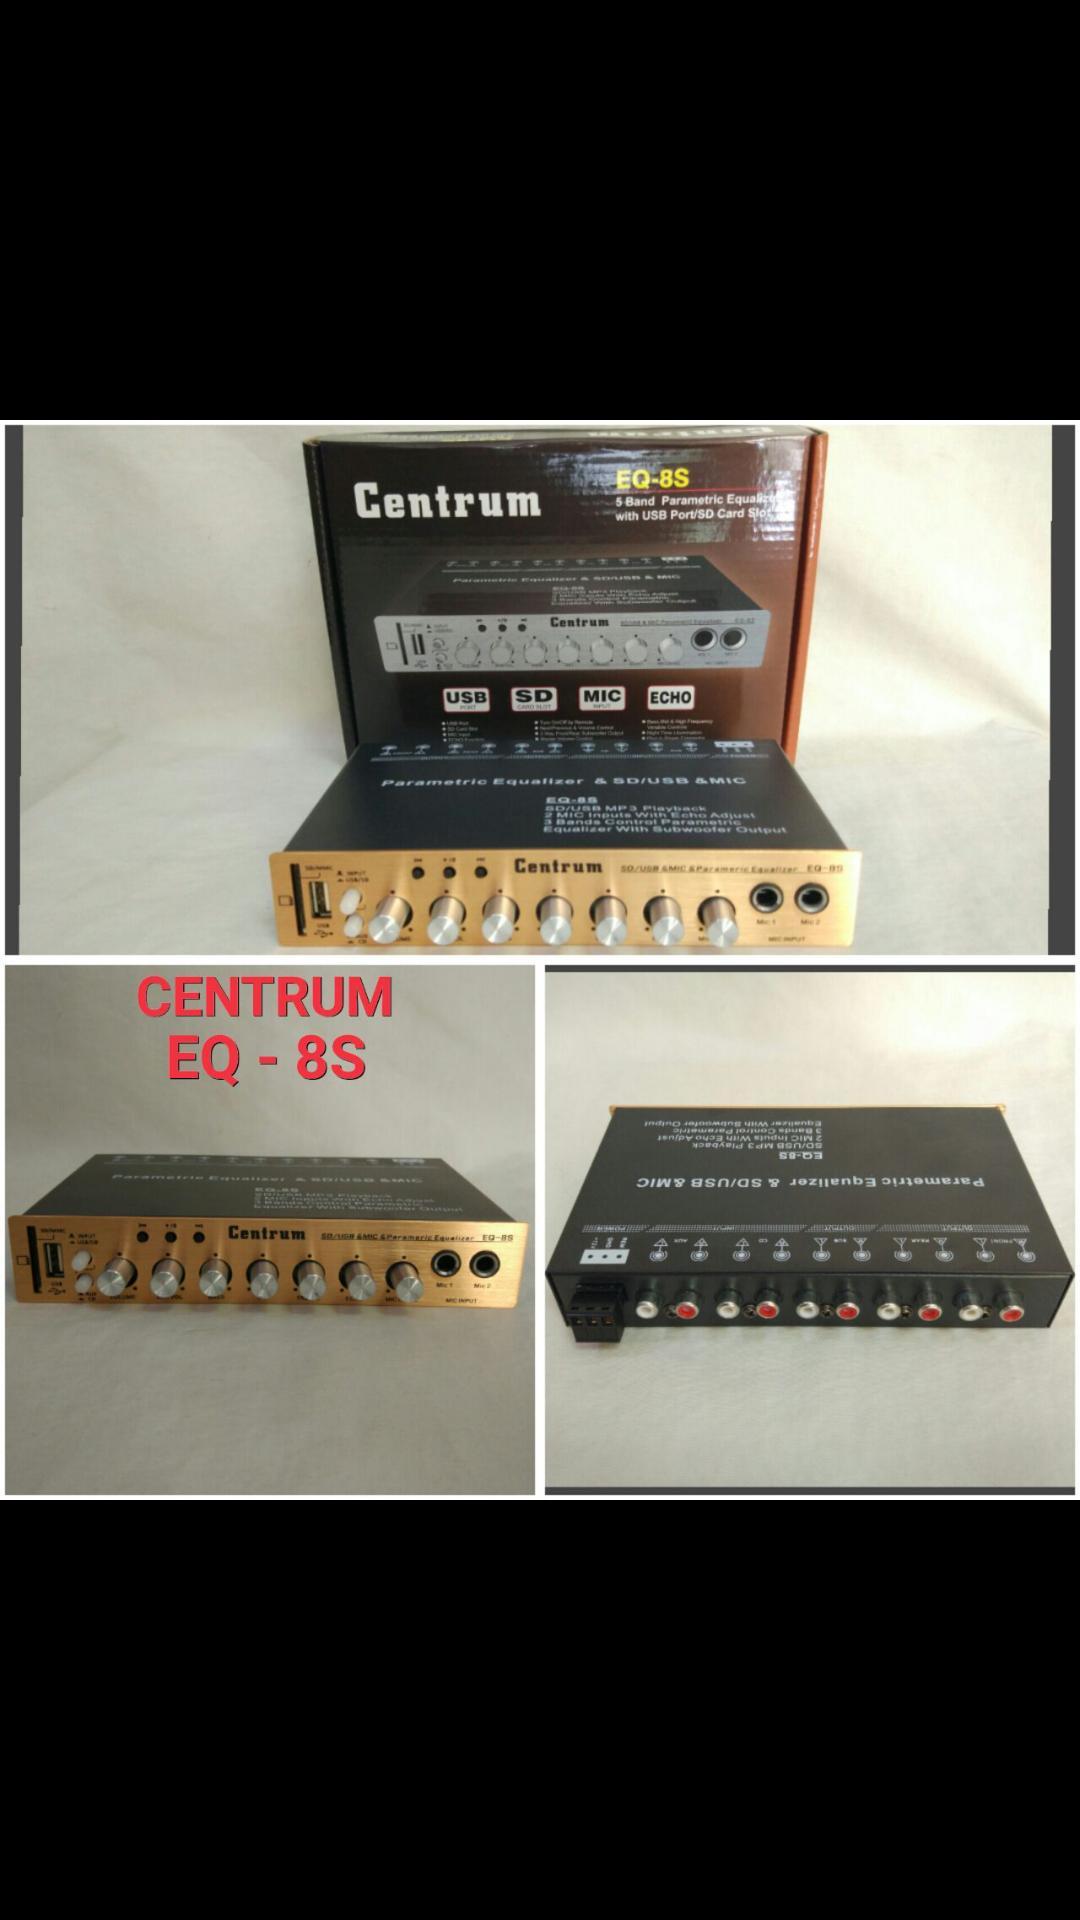 Centrum EQ 8S original Equalizer amplifier Parametric Pre Amp Audio Mobil car suara bas ampli USB MP3 MUSIK karaoke LIT BONUS GRATIS ONGKIR